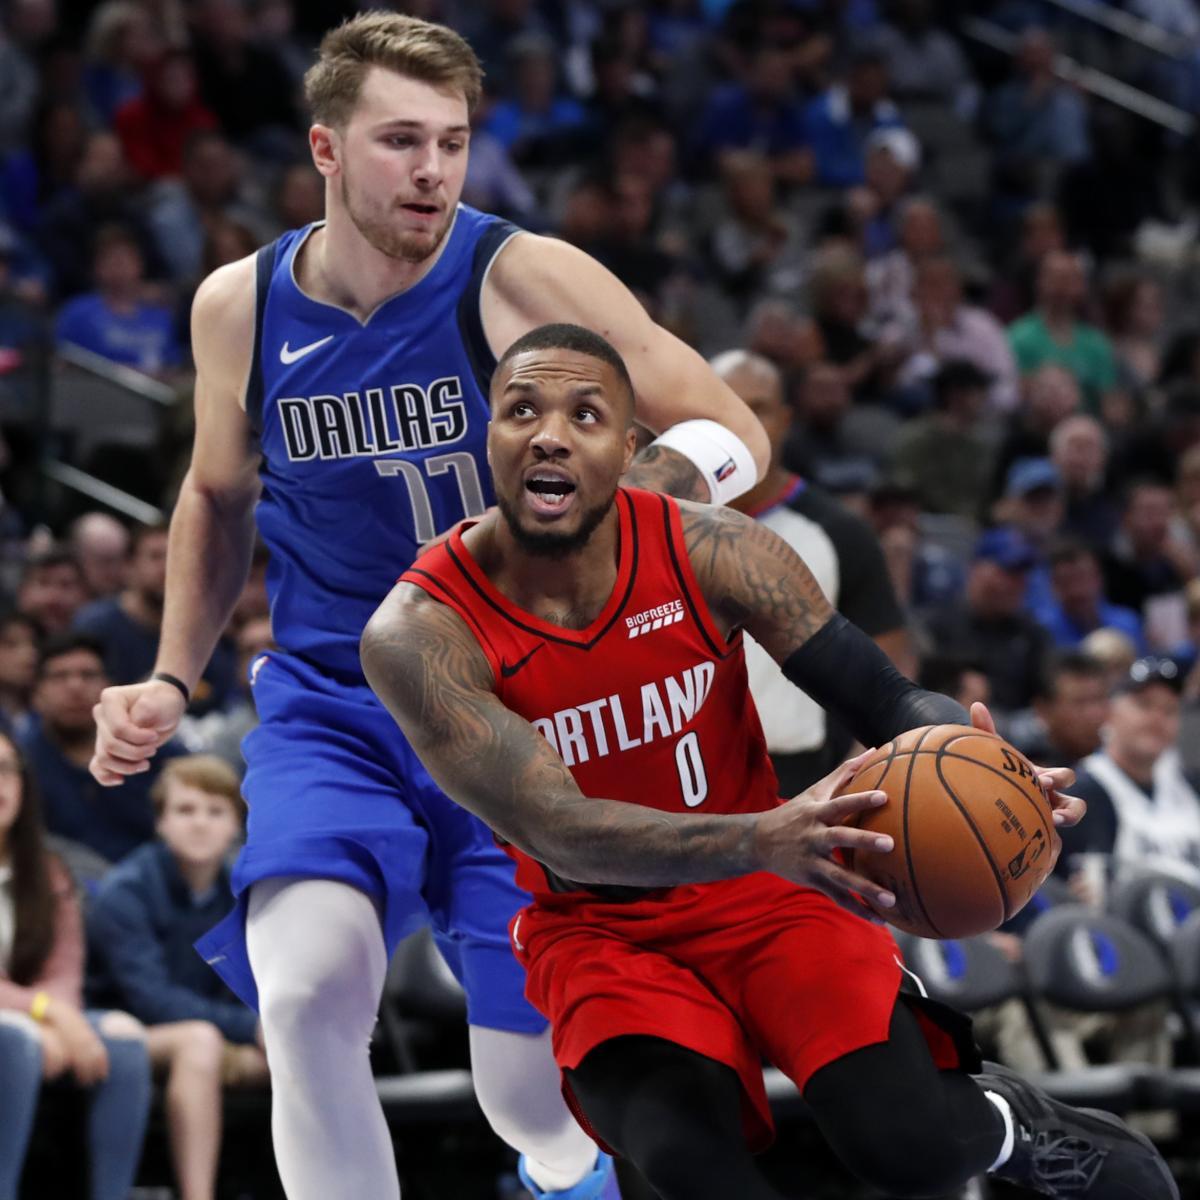 2021 B/R NBA Player Rankings: Predicting Top 25 Guards This Season